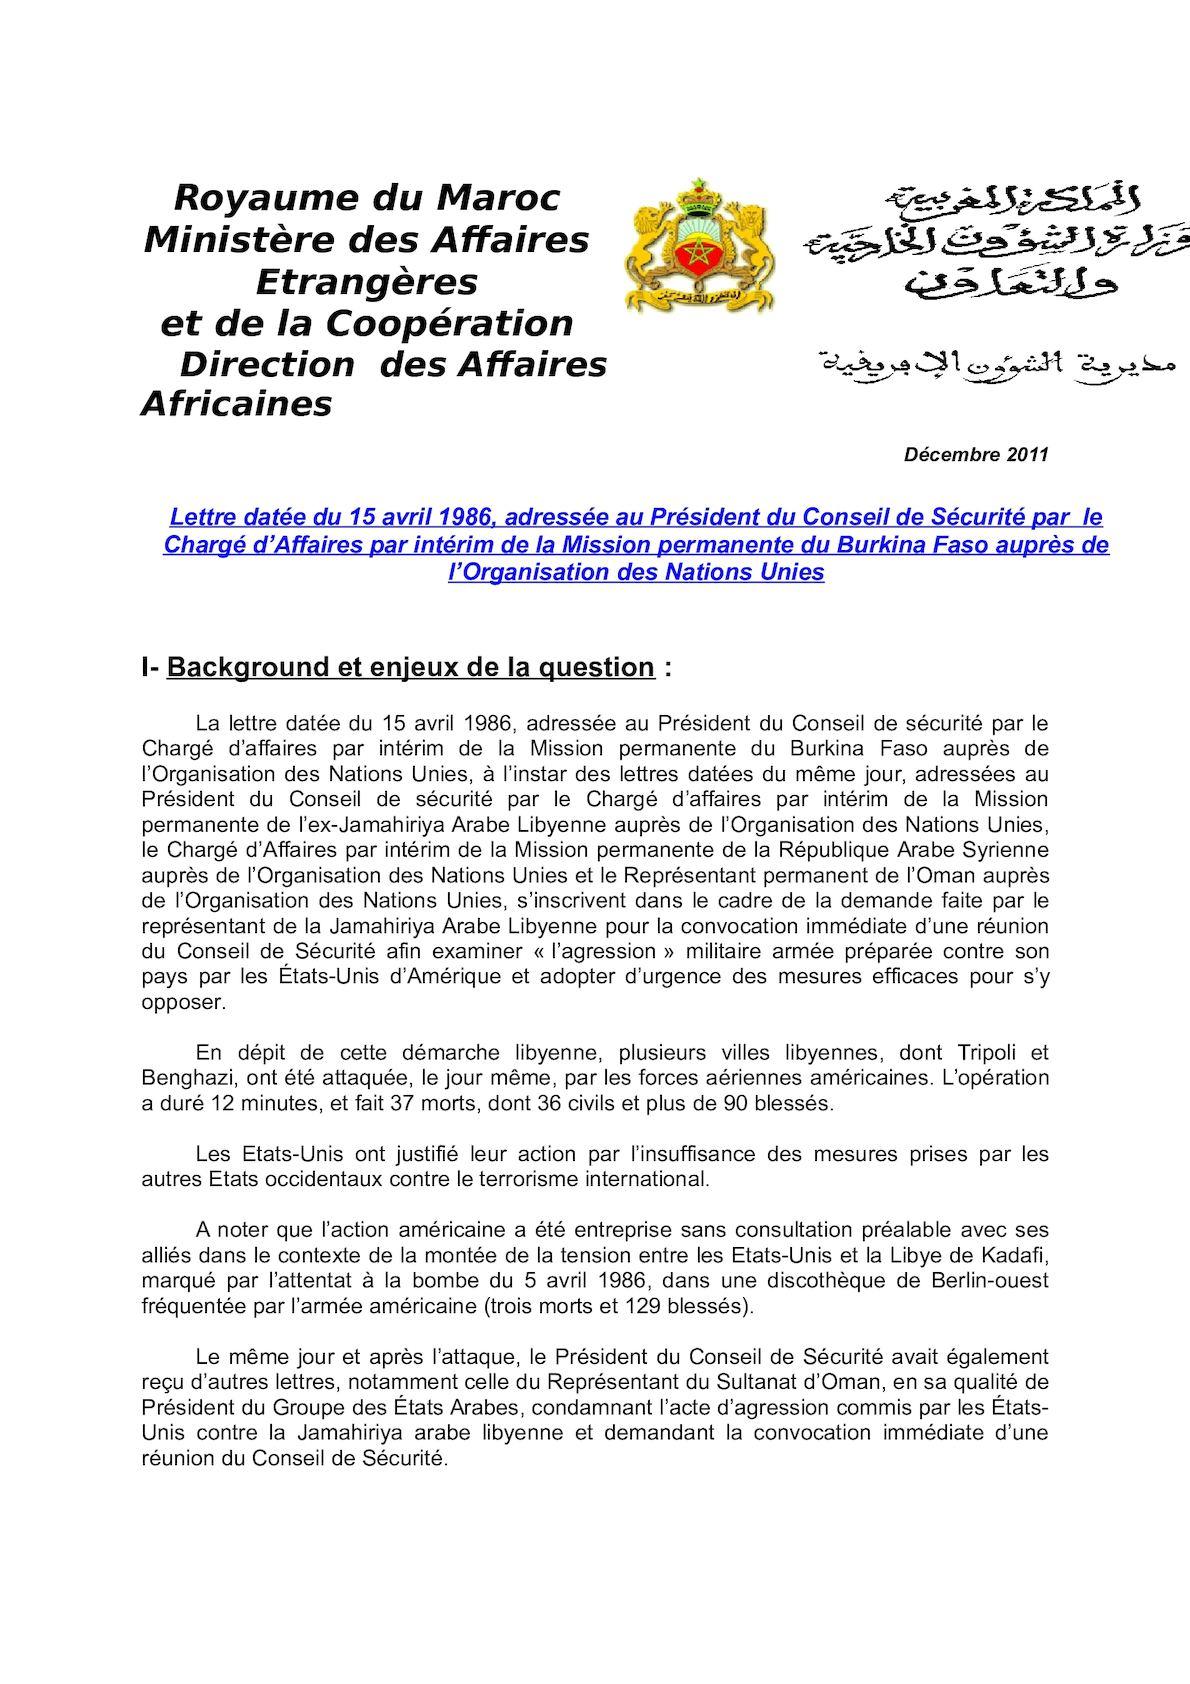 Lettre Conseil De Sécurité, Burkina Faso